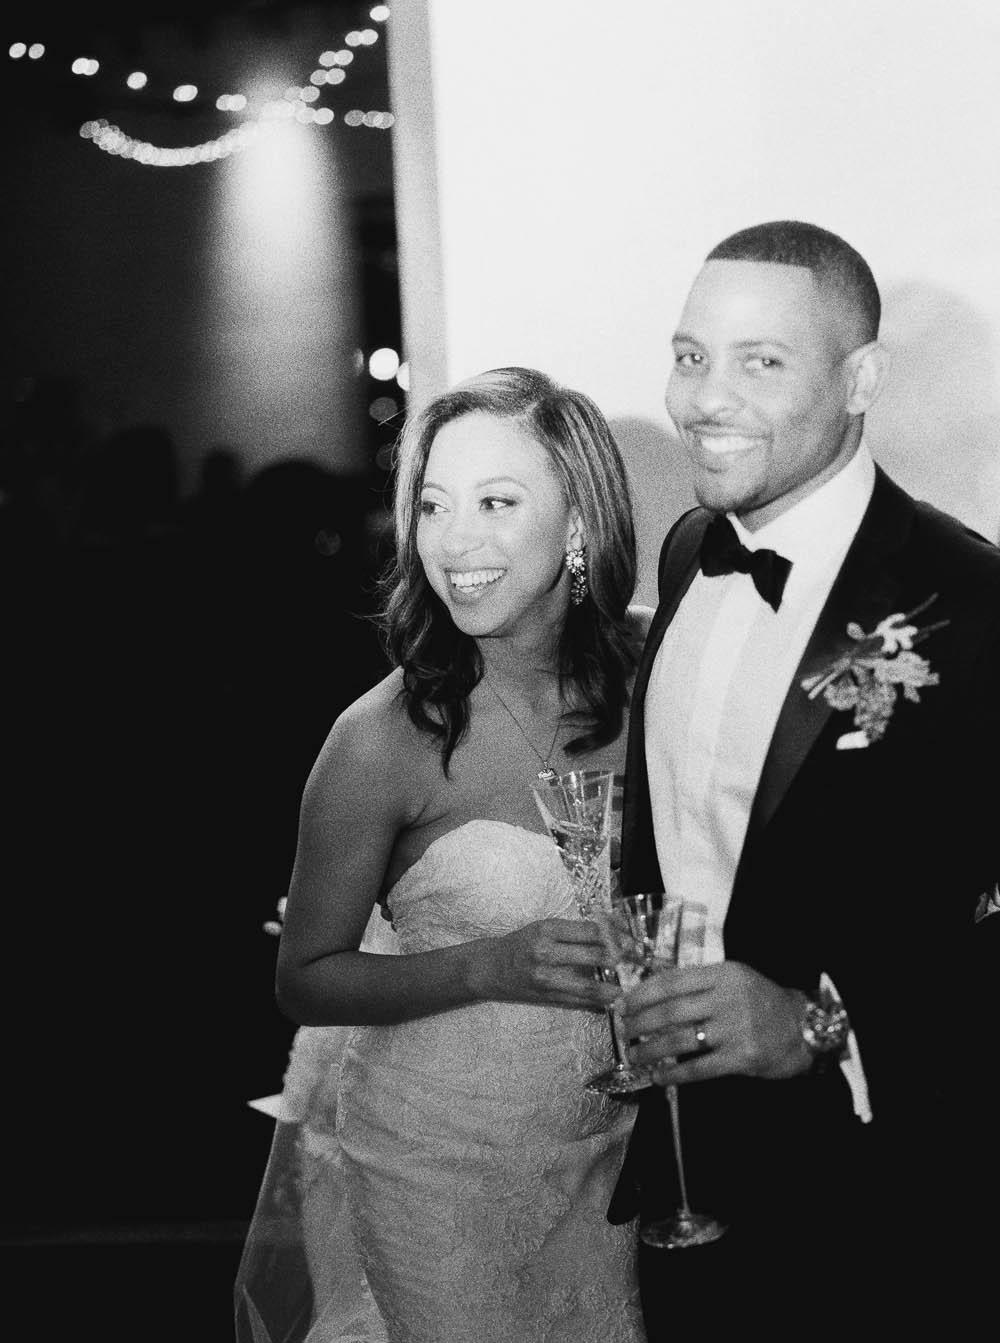 nashville ruby film documentary wedding photographer heartfelt real moments african american wedding munalachi bride ©2016abigailbobophotography-51.jpg